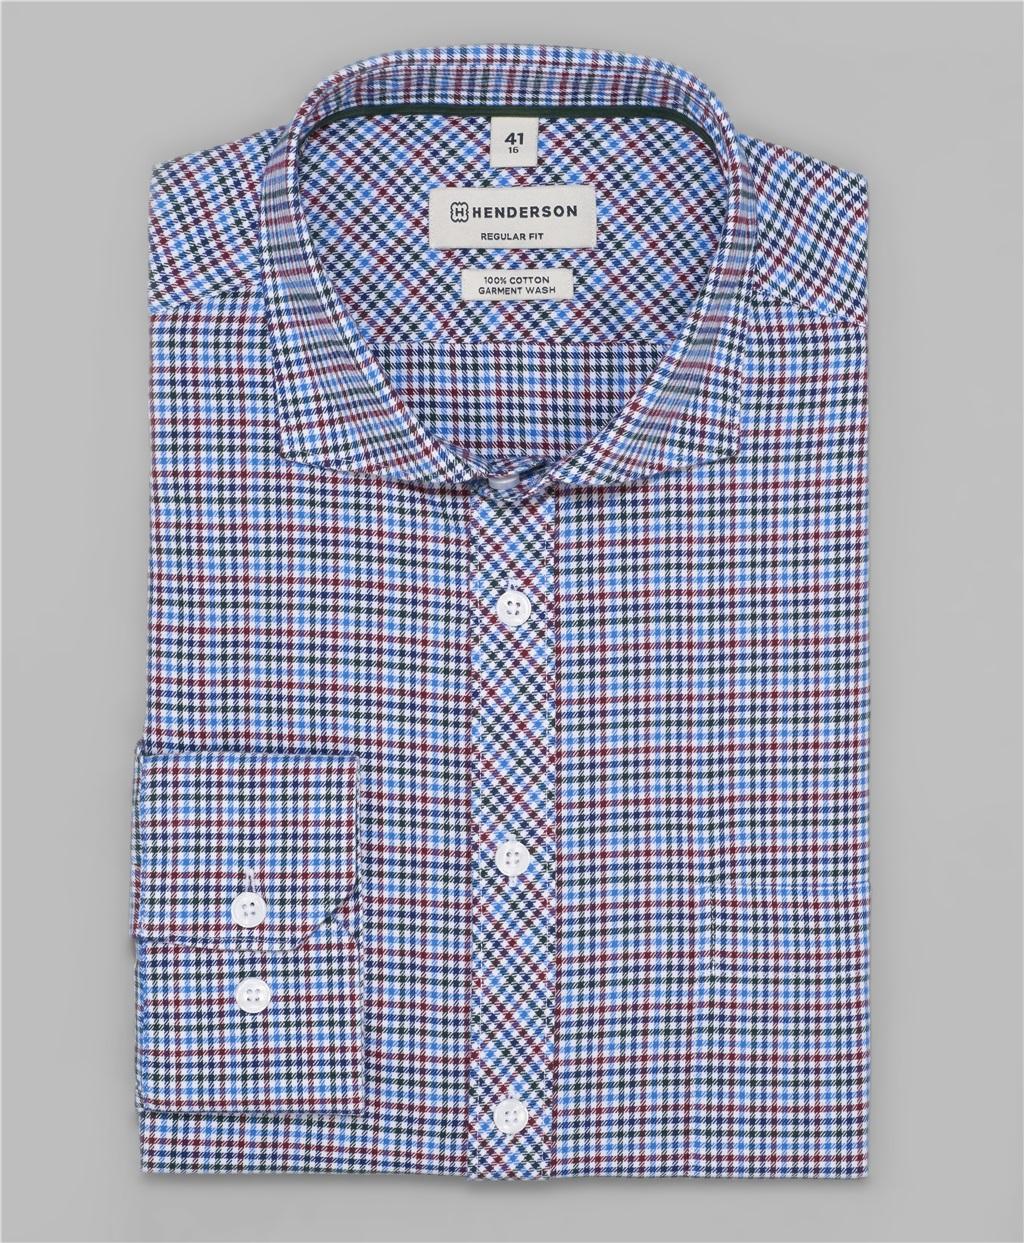 Рубашка прямой силуэт HENDERSON SHL-1117-N BLUE фото